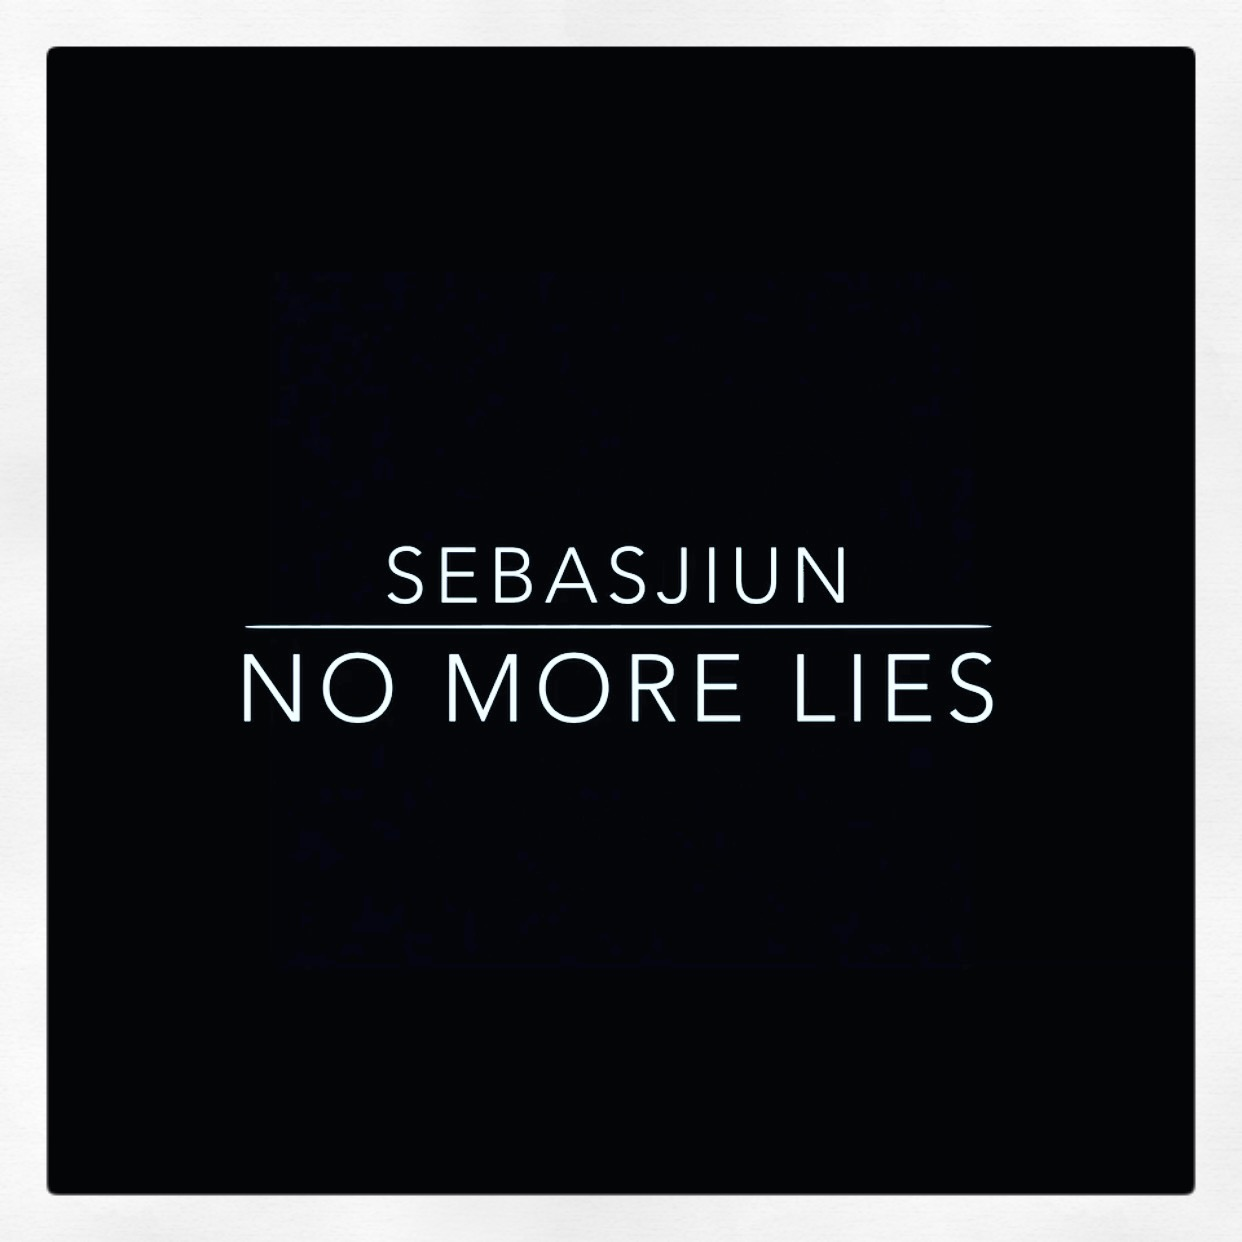 NO MORE LIES -